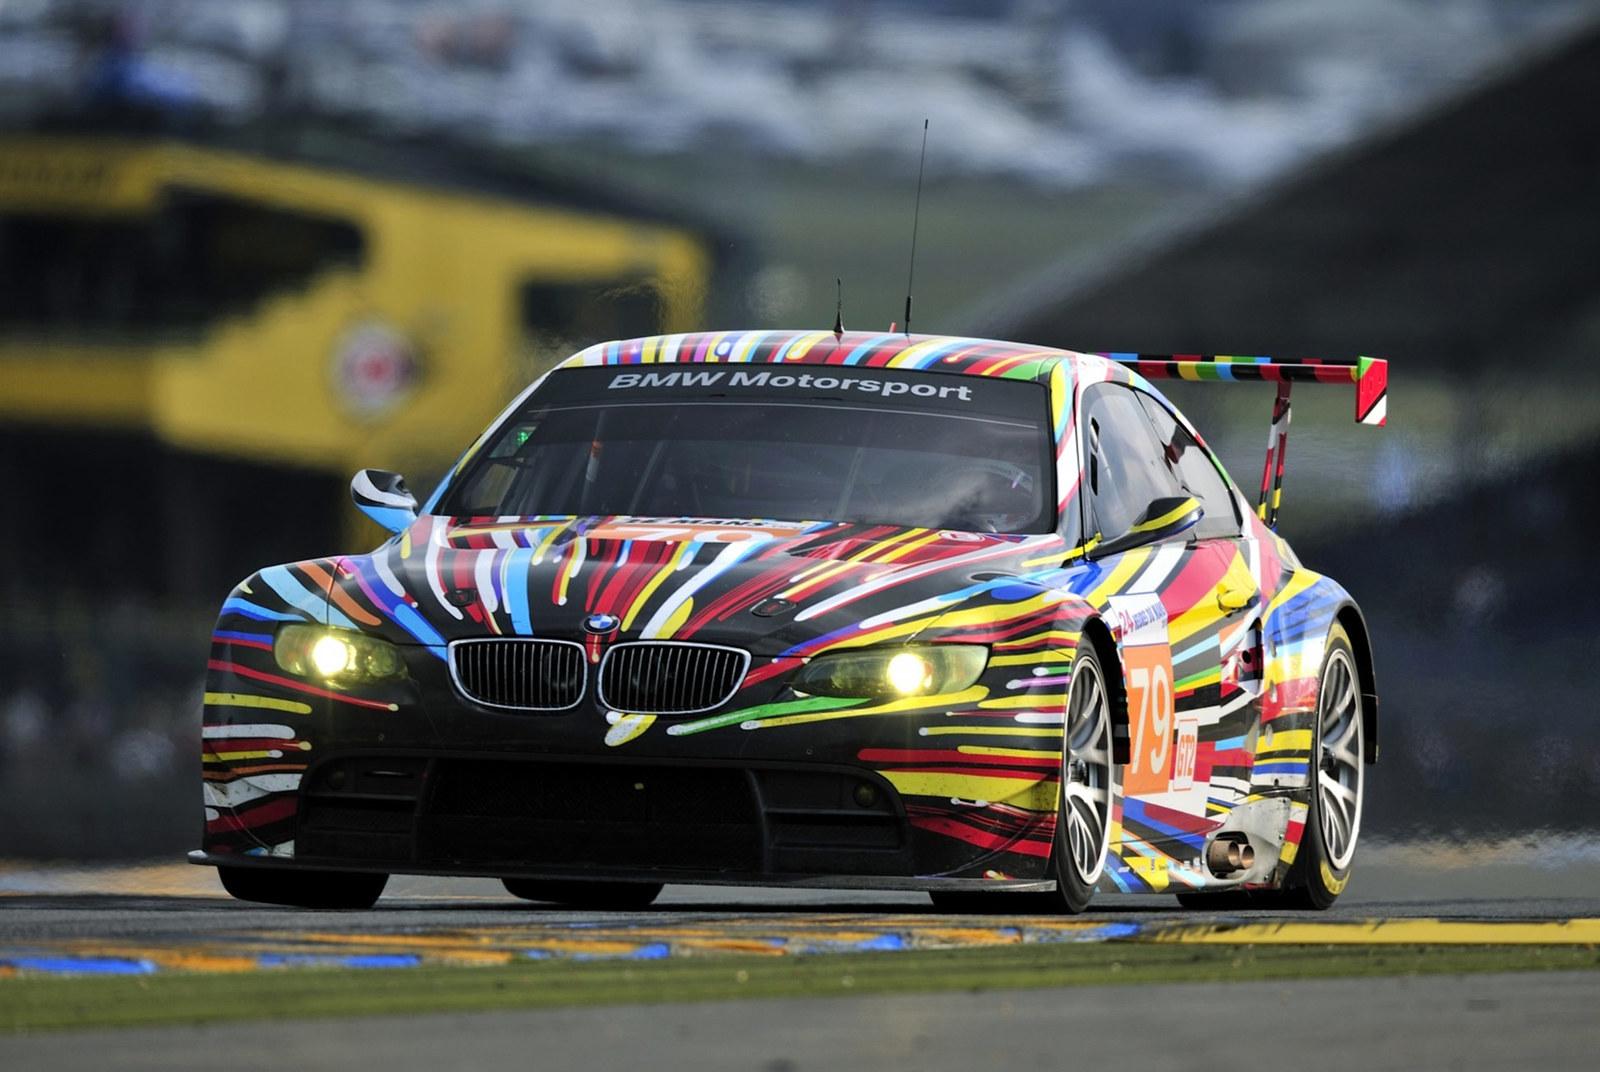 2010-BMW-M3-GT2-Jeff-Koons-Art-Car.jpg